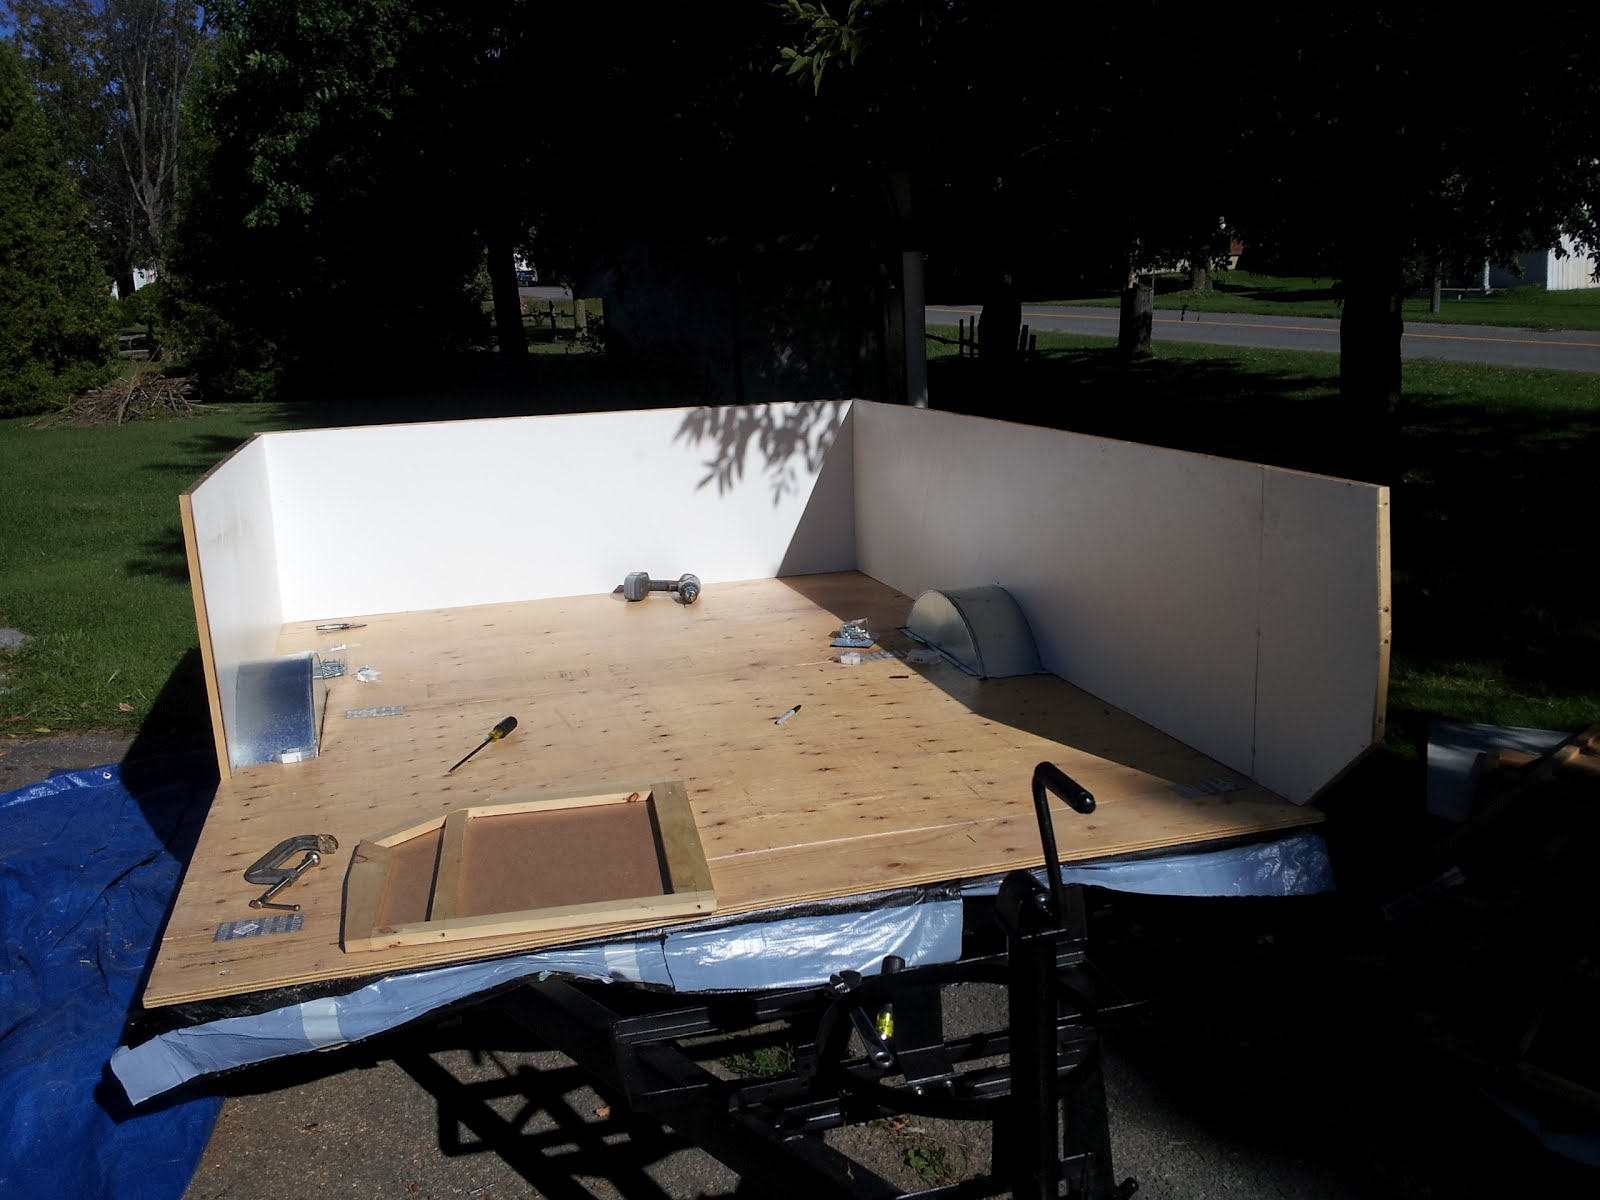 projet tente roulotte bonair septembre 2012. Black Bedroom Furniture Sets. Home Design Ideas